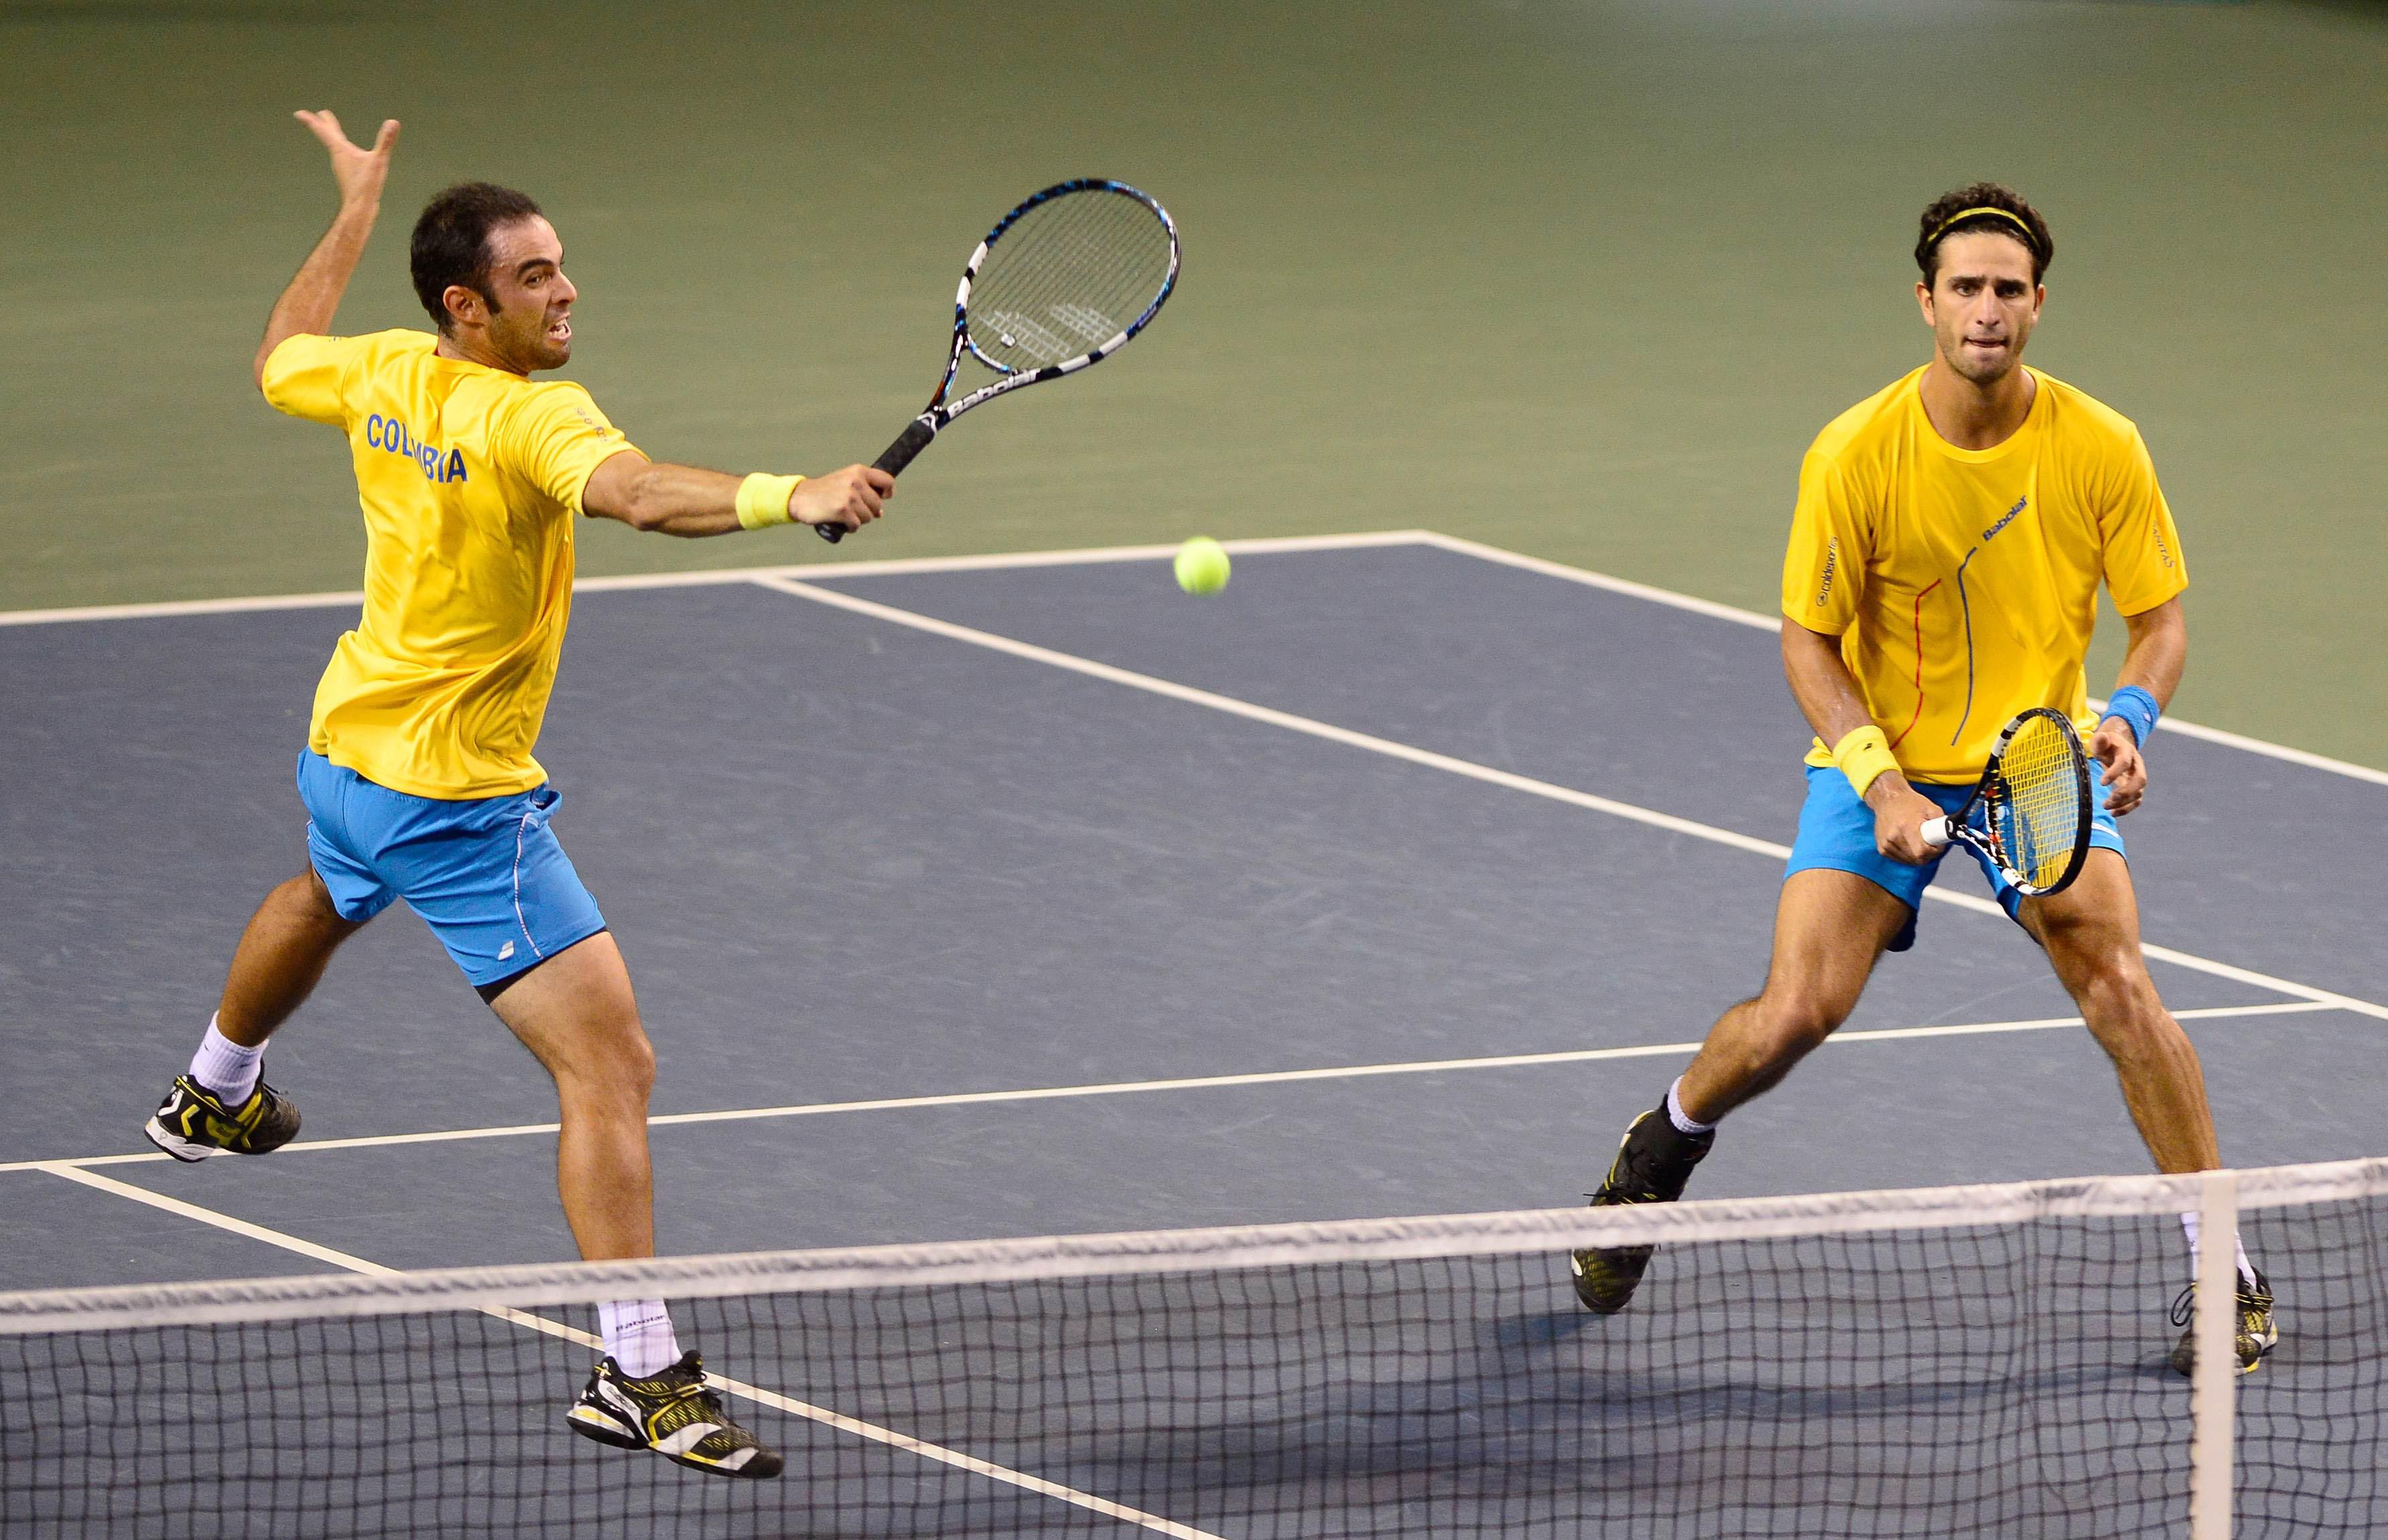 Cabal y Farah a segunda ronda del Australian Open. Giraldo y González afuera